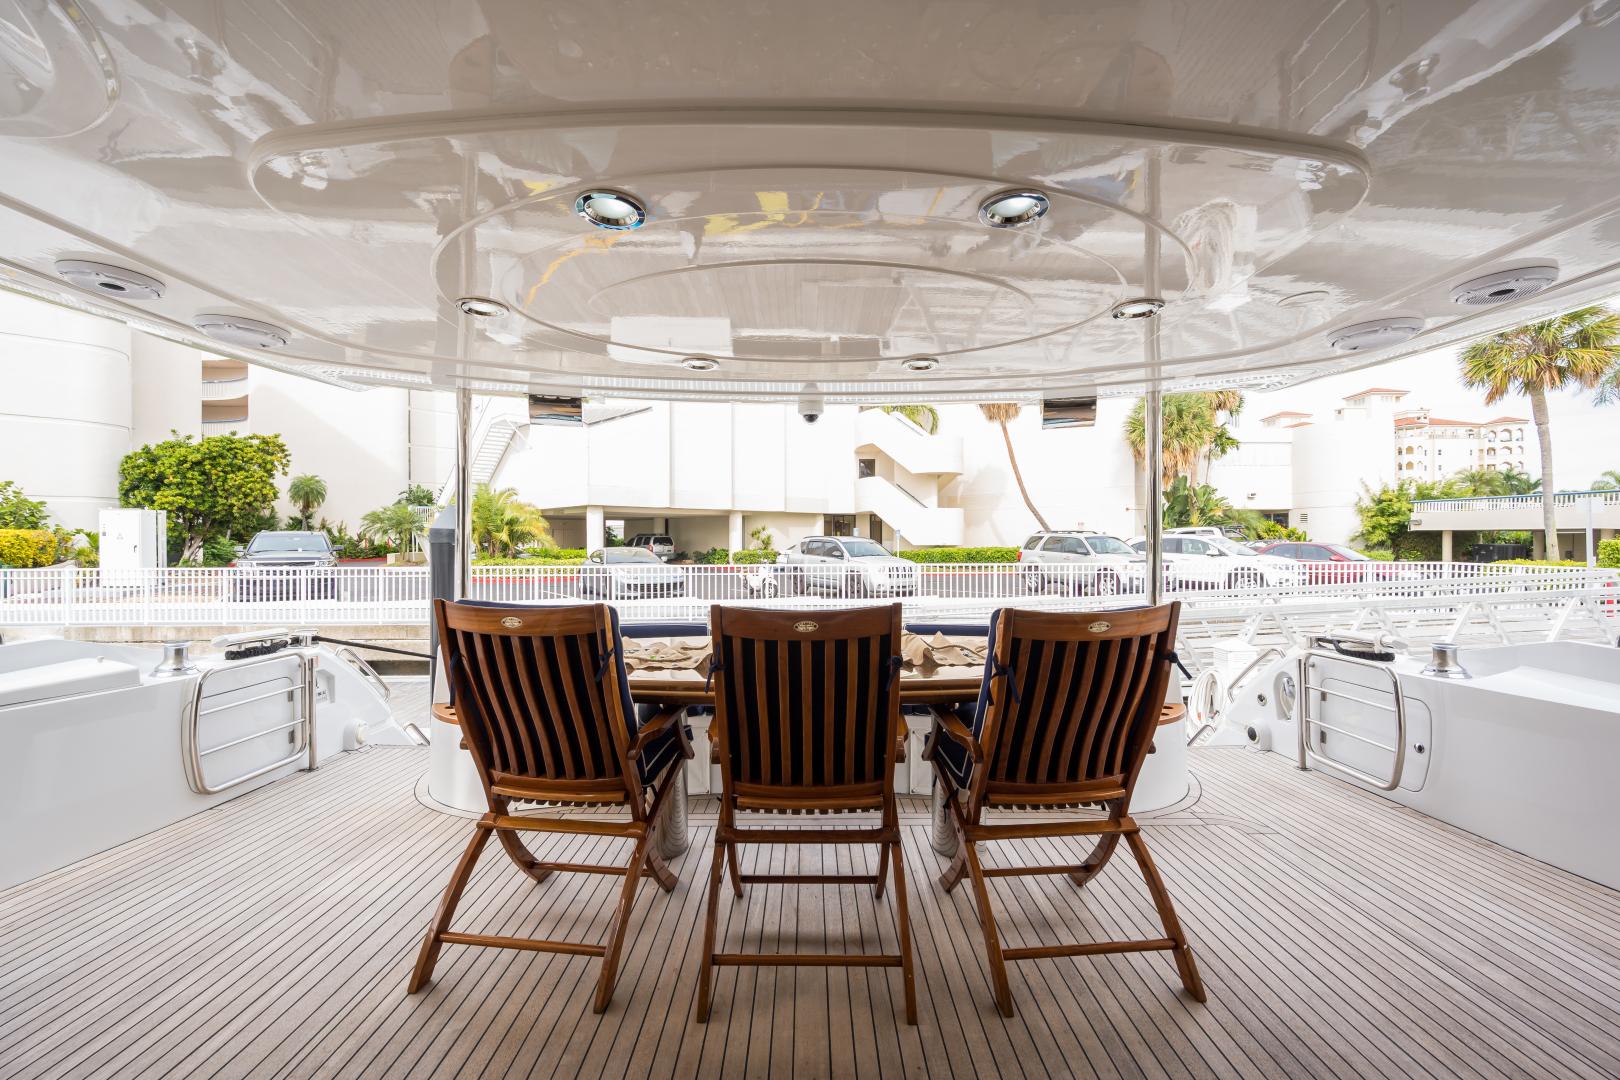 Sunseeker-Yacht 2004-TOP GUN Aventura-Florida-United States-1450694 | Thumbnail